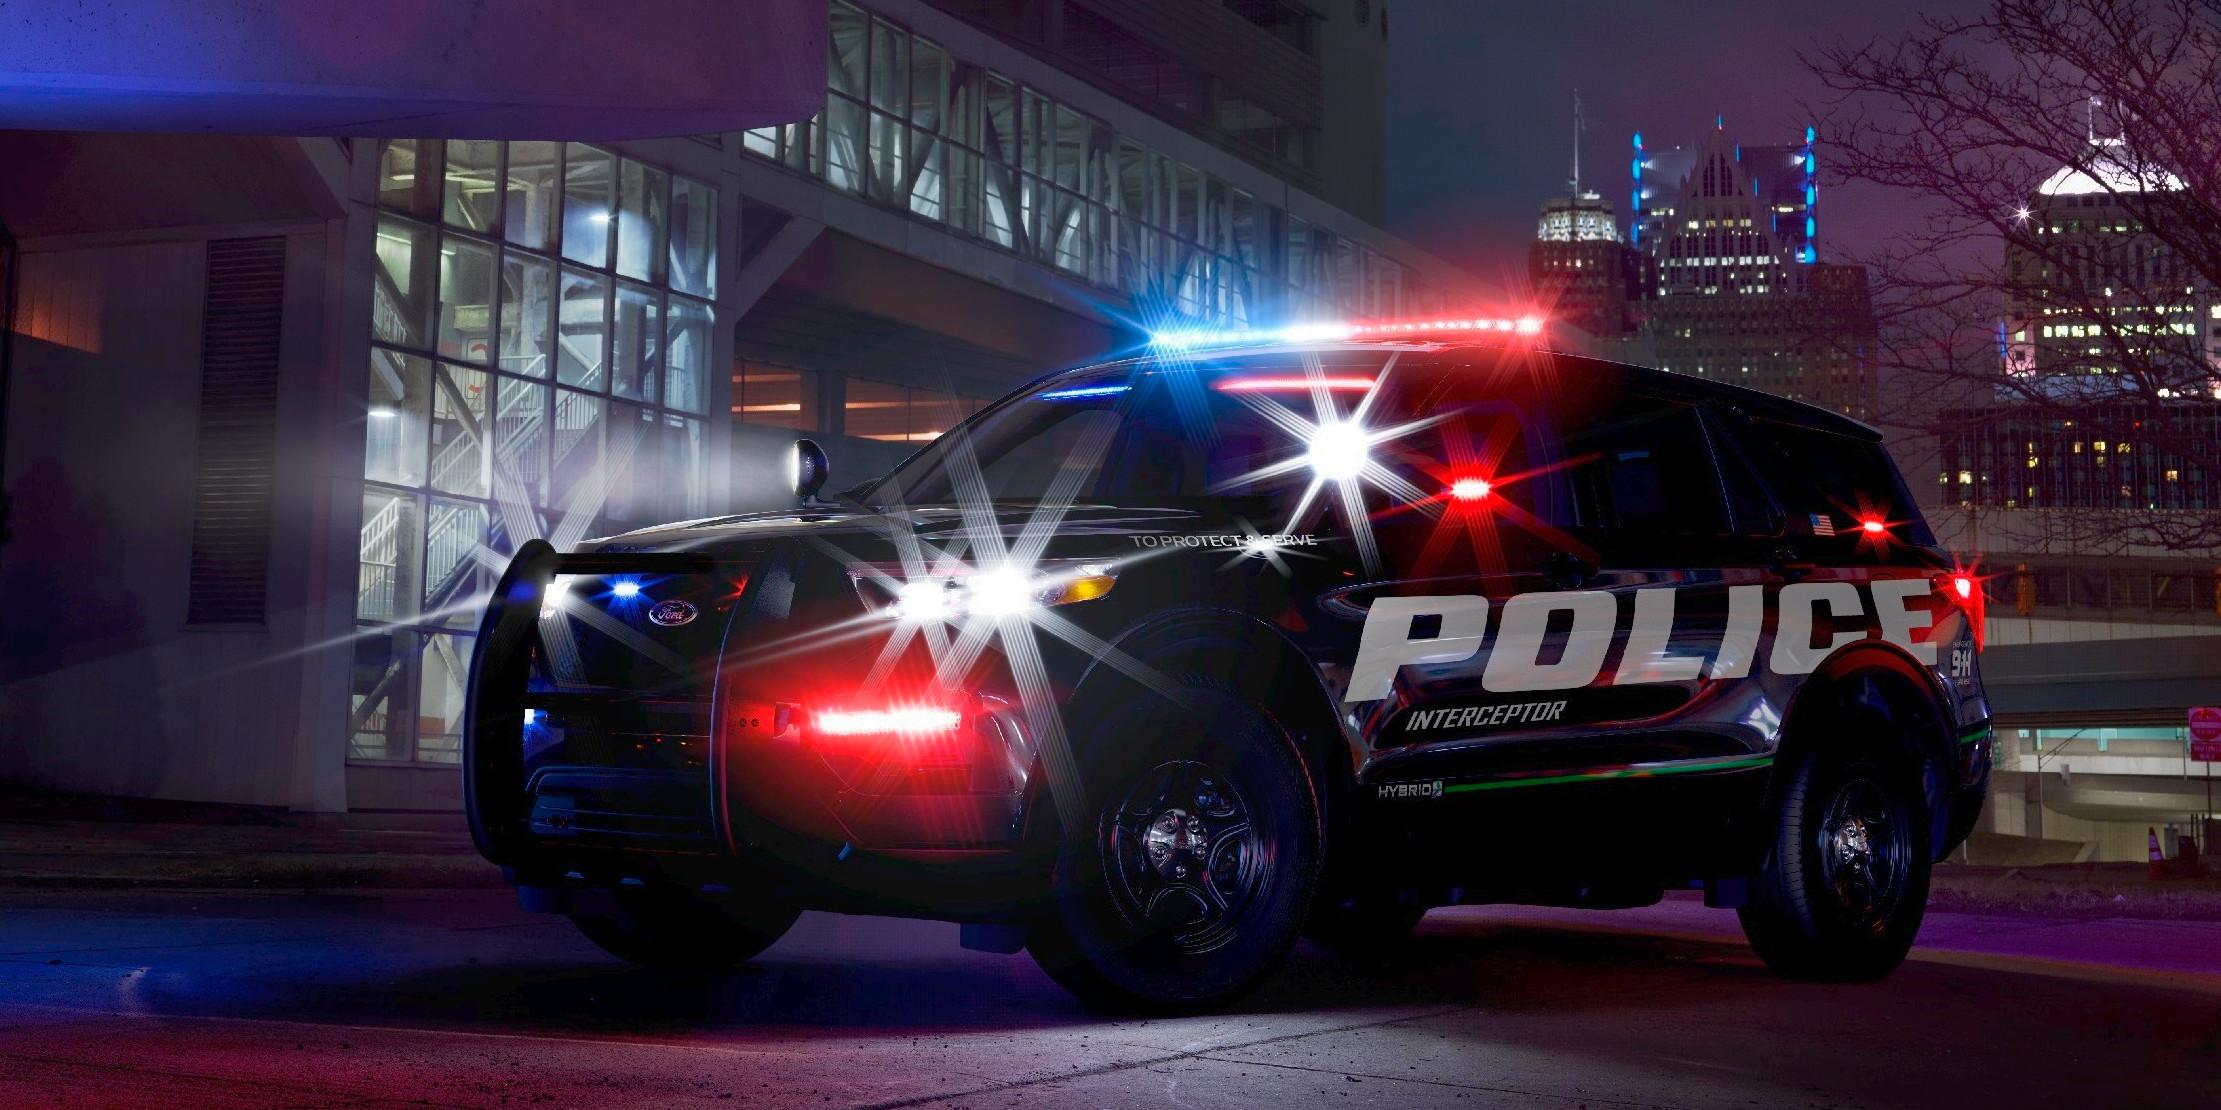 2020 Ford Police Interceptor Utility Previews New Explorer SUV - autoevolution